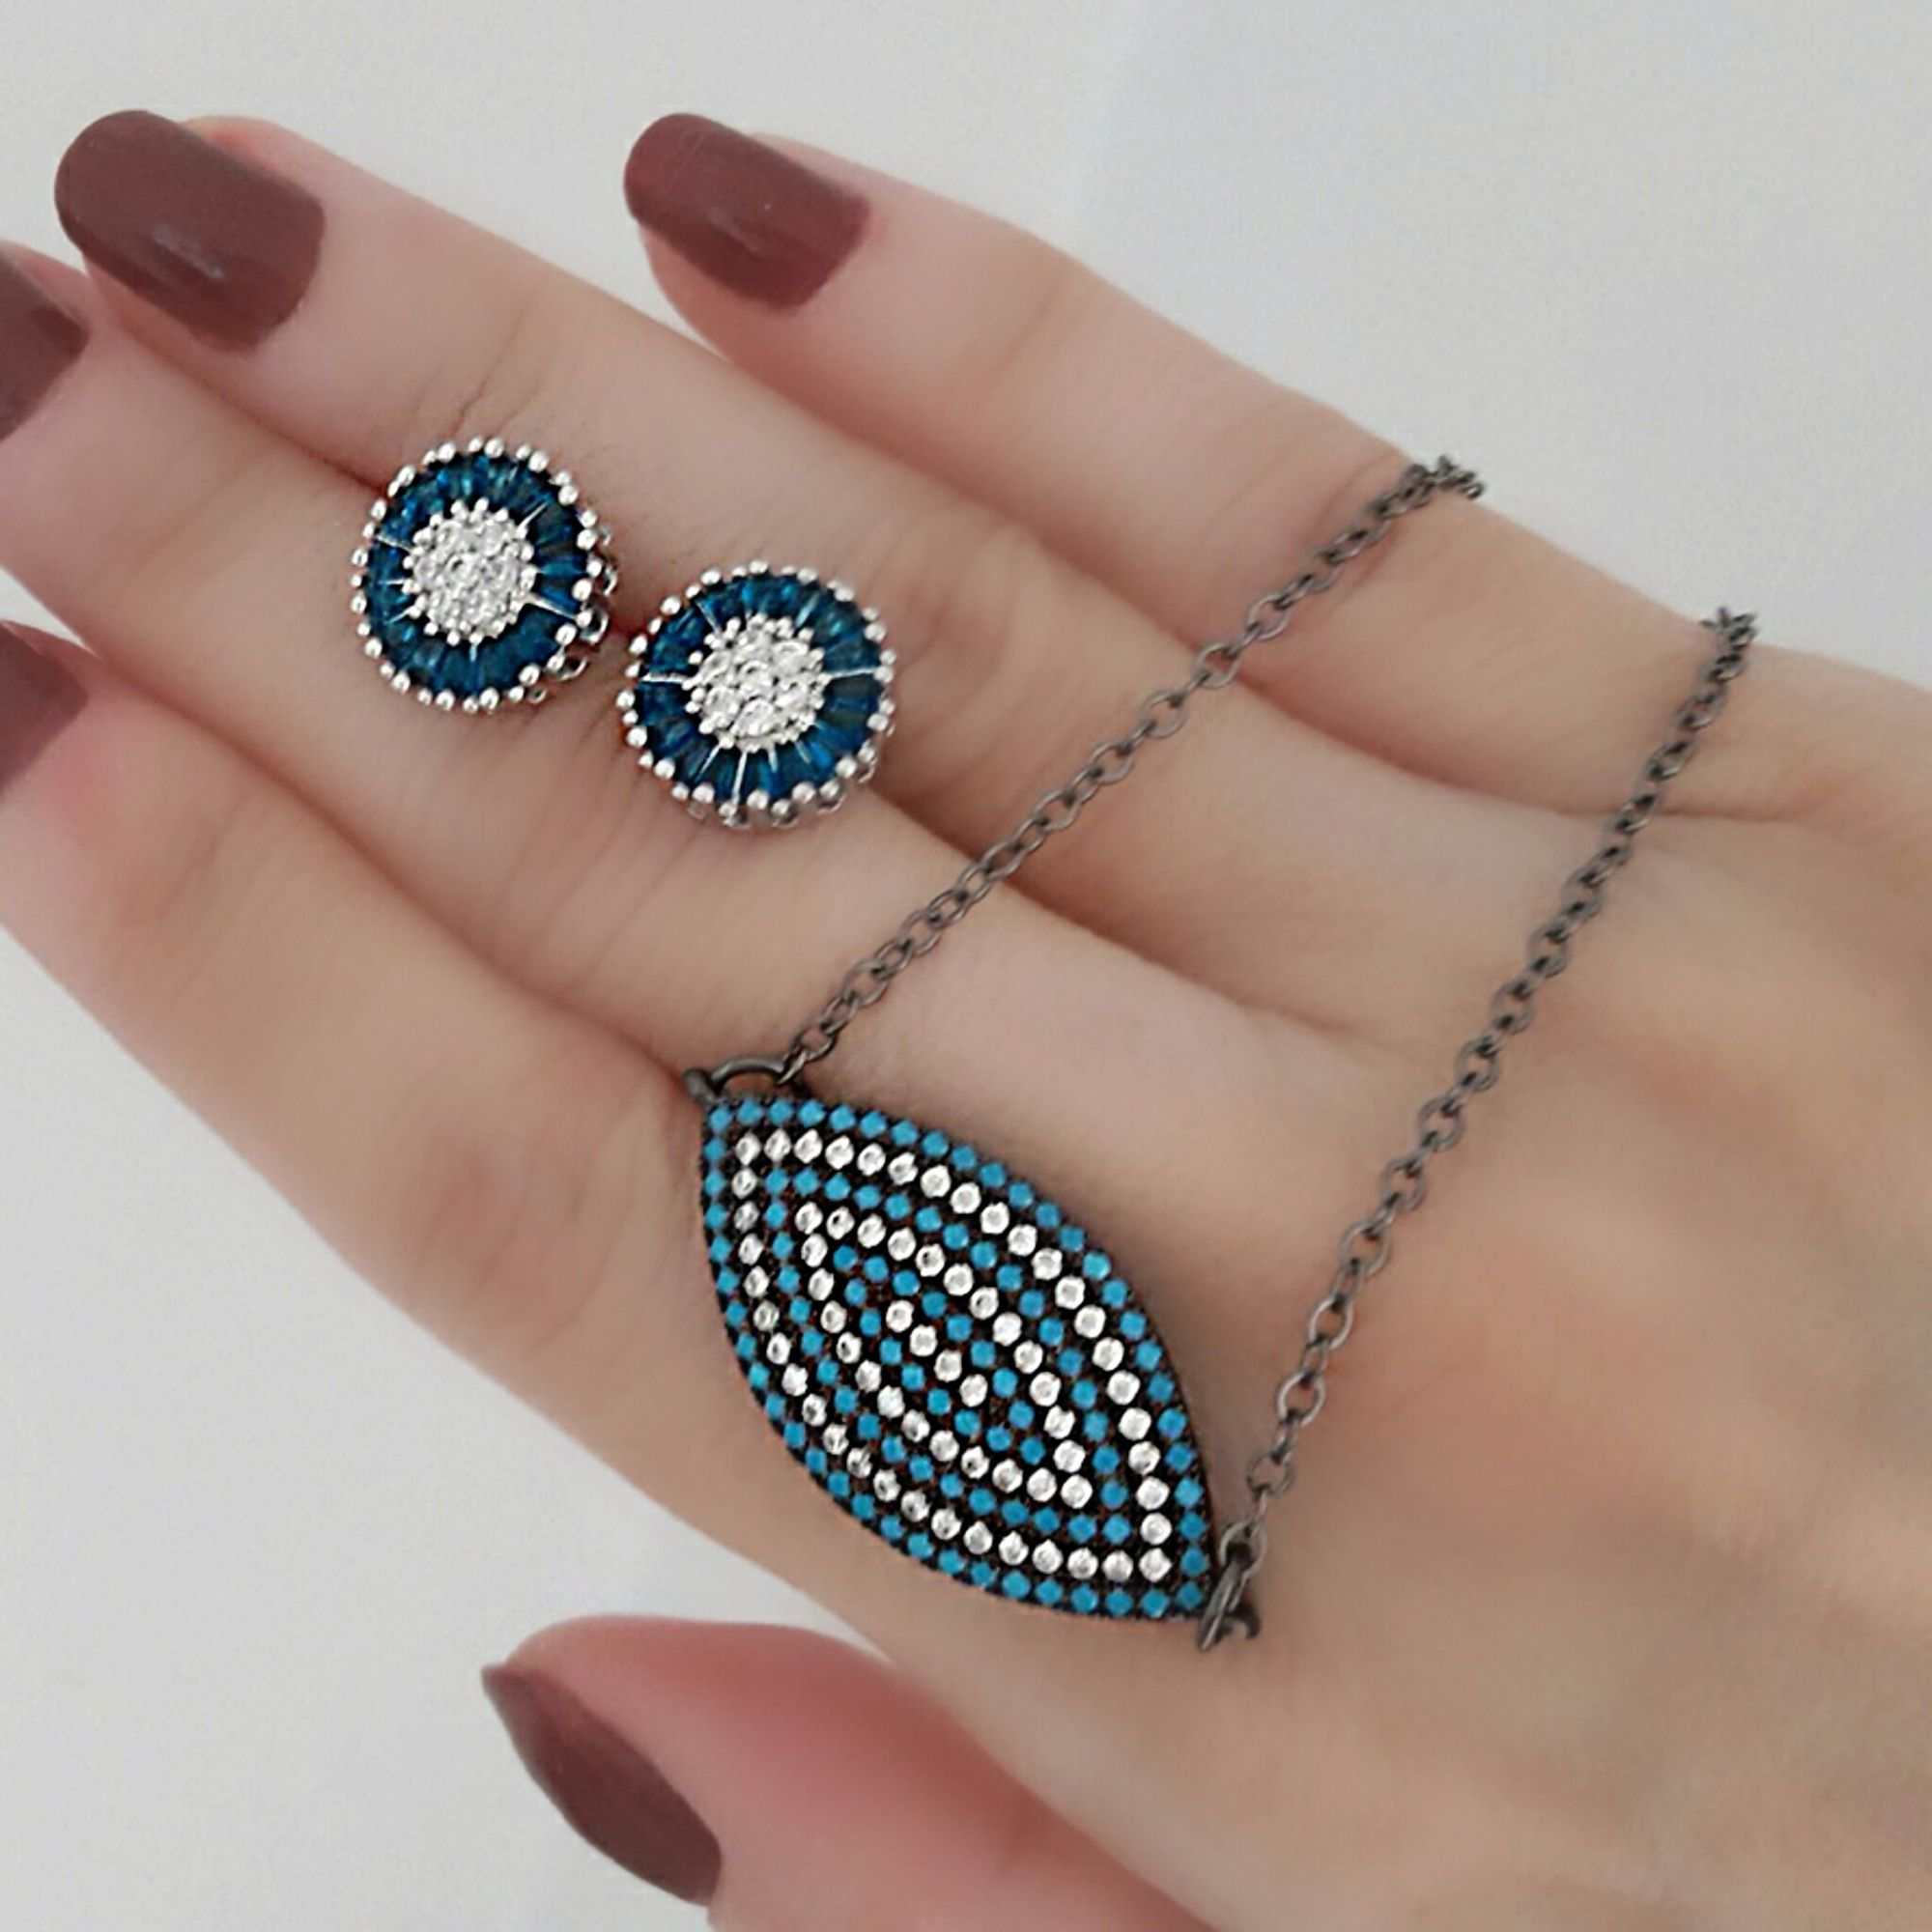 Colar Pingente Olho Grego Zircônias Azul Turquesa e Branca Ródio Negro Semijoia  - Soloyou